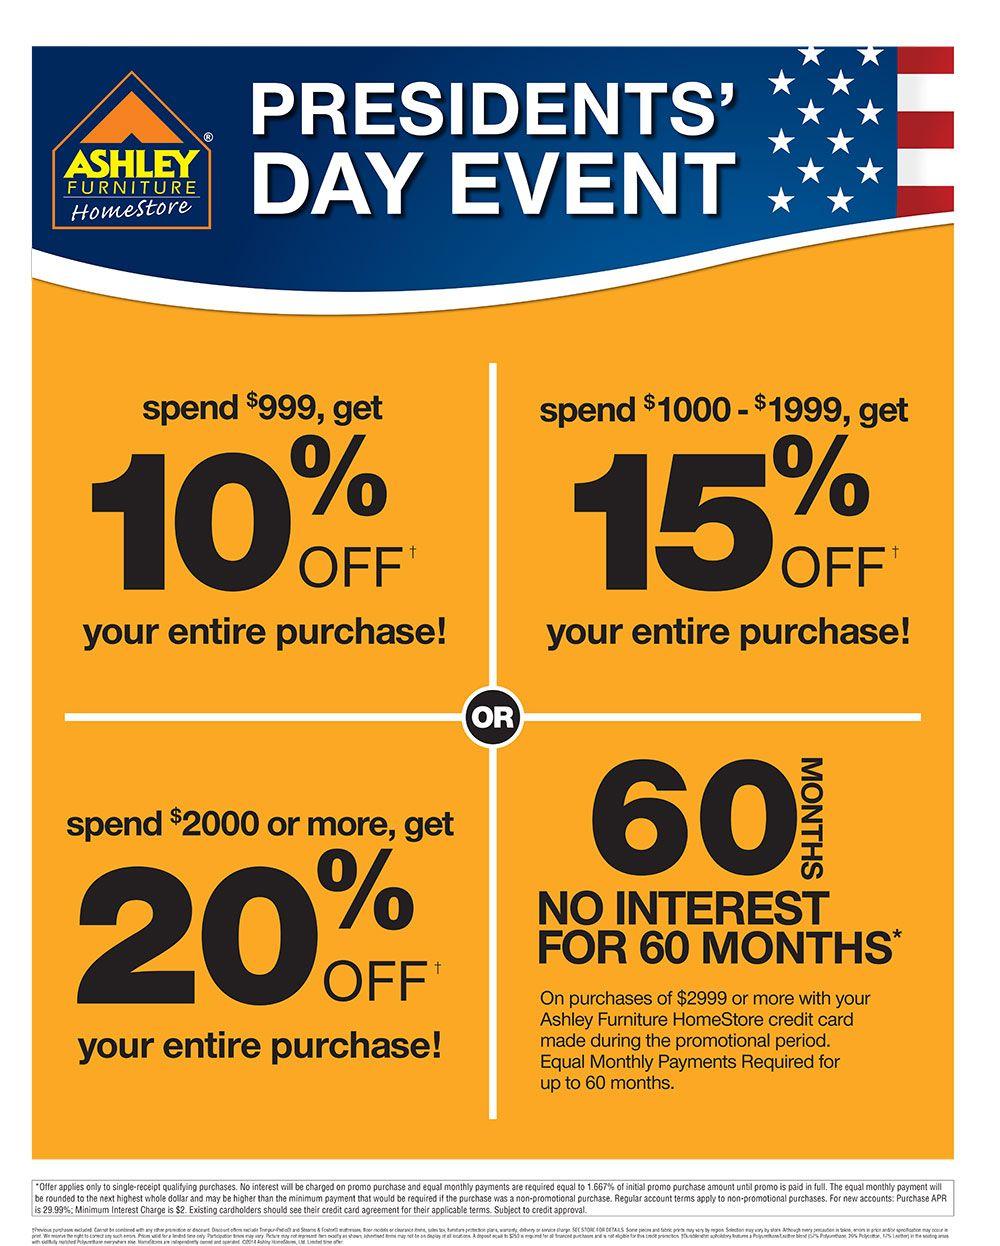 Presidentsu0027 Day Event At #AshleyFurniture In Richland, WA #PresidentsDay # Sale #